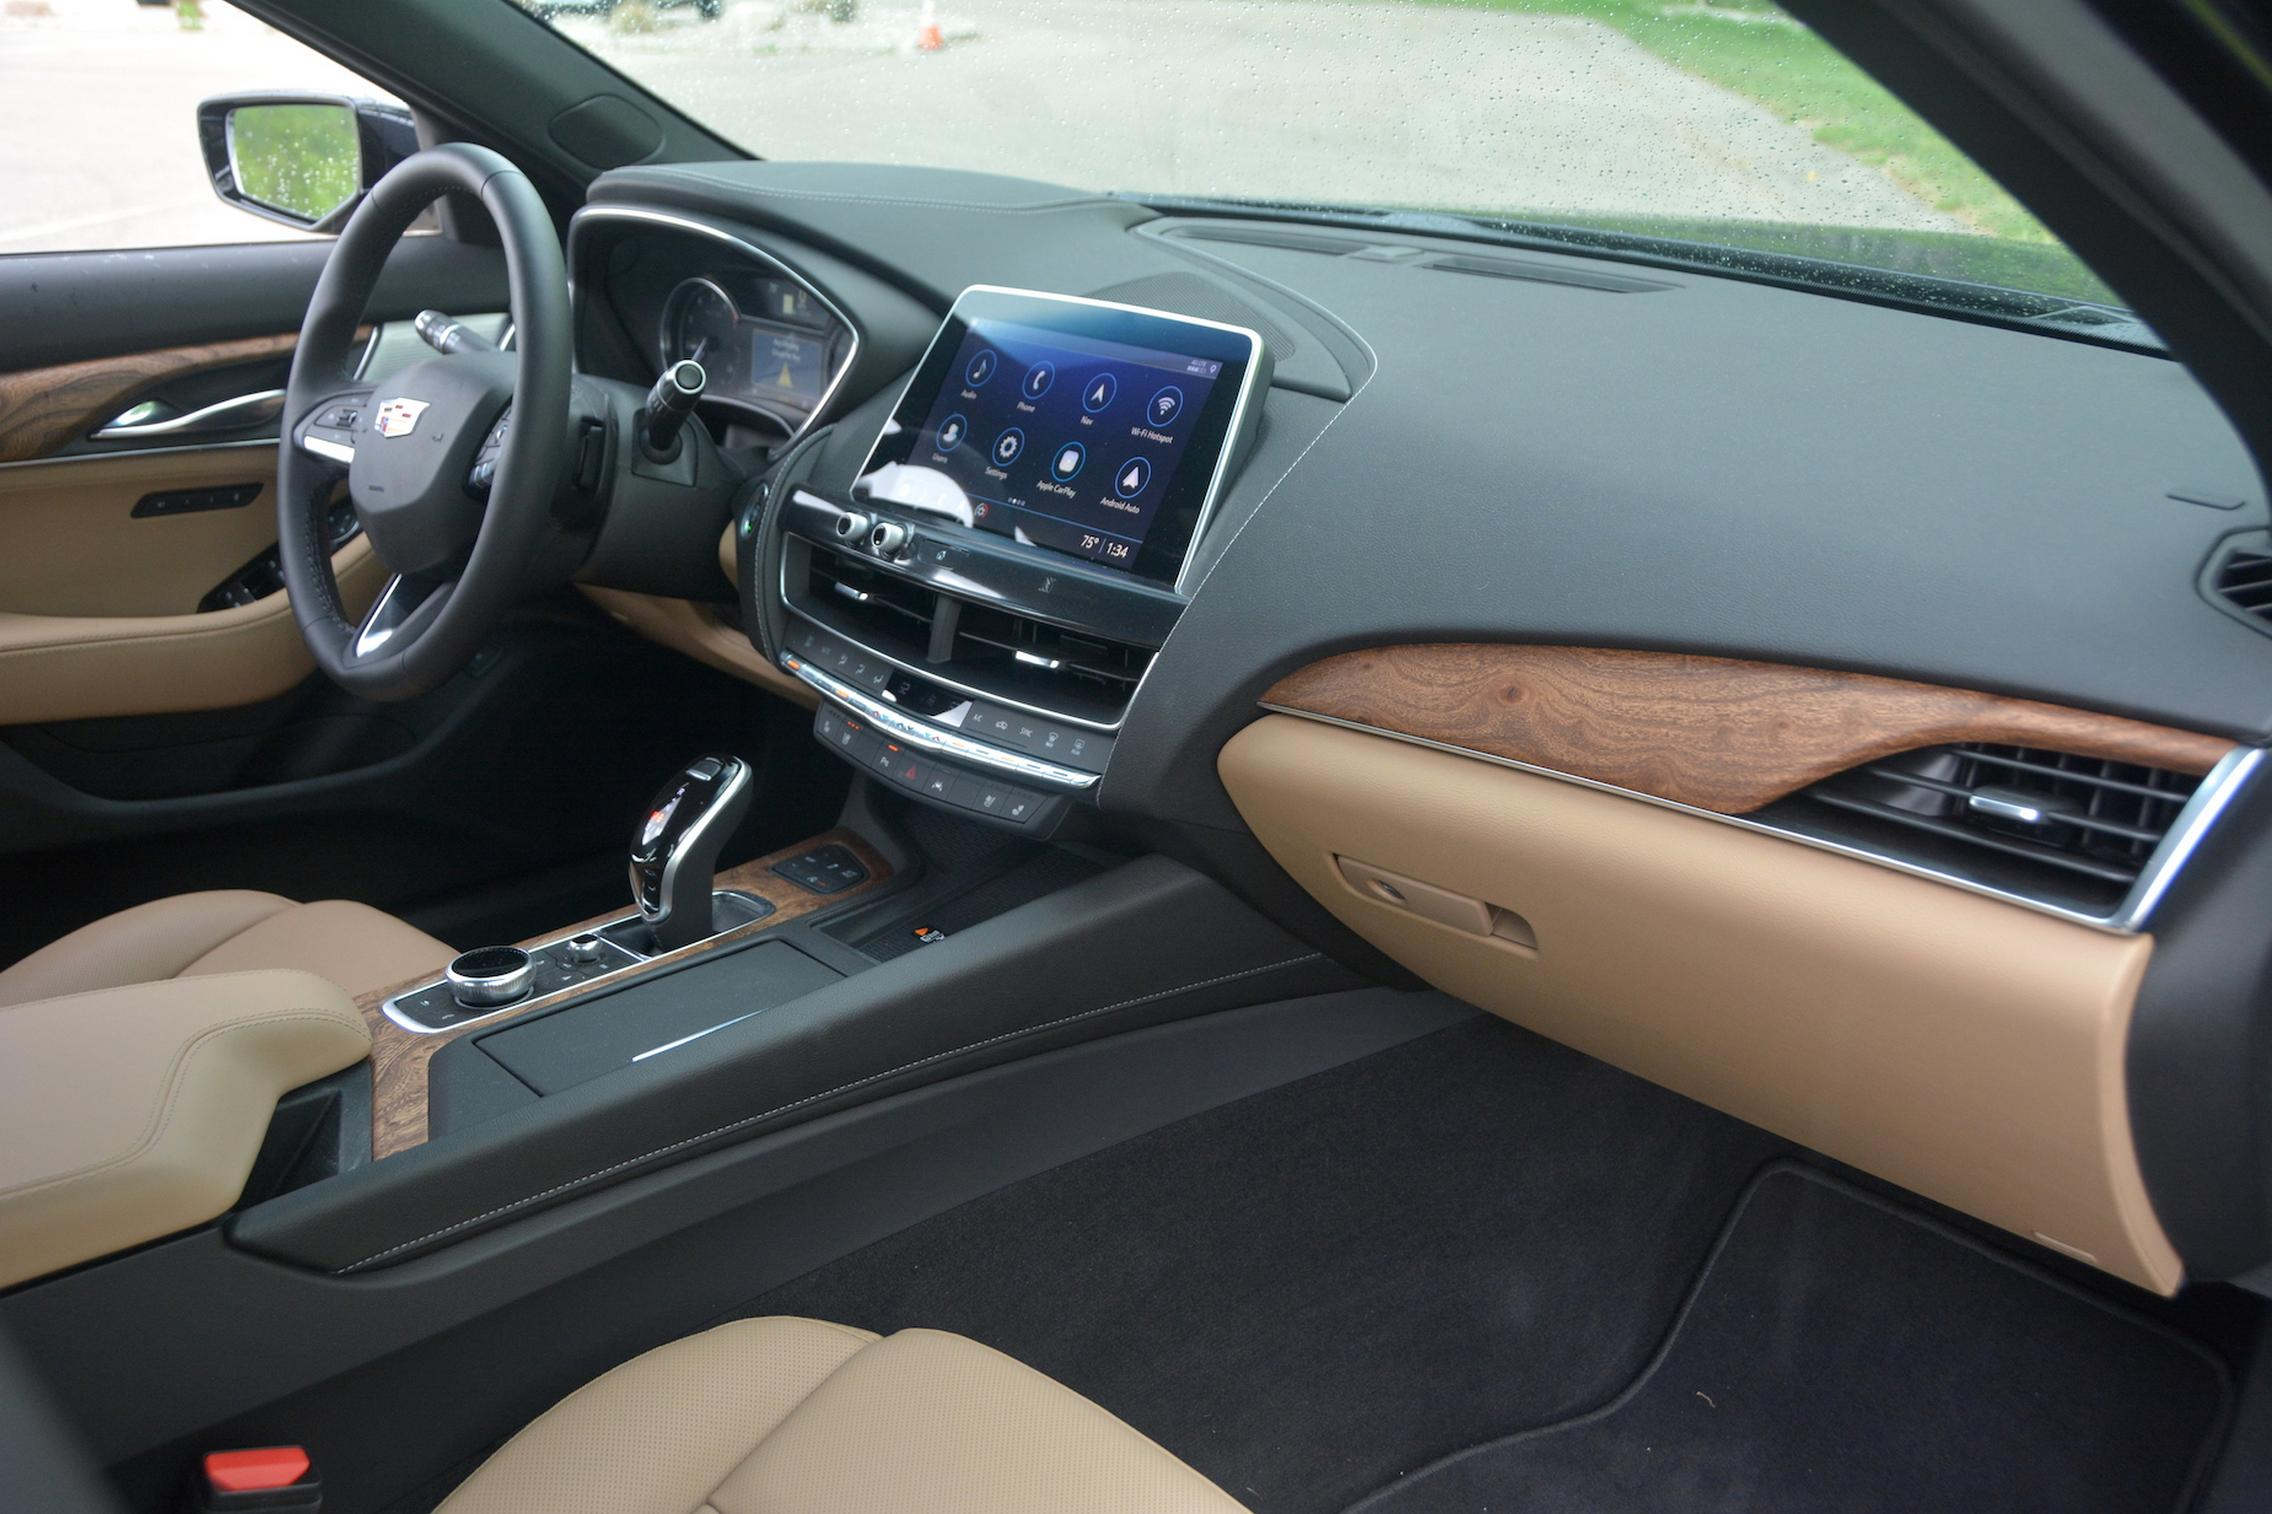 2021 Cadillac CT5 interior